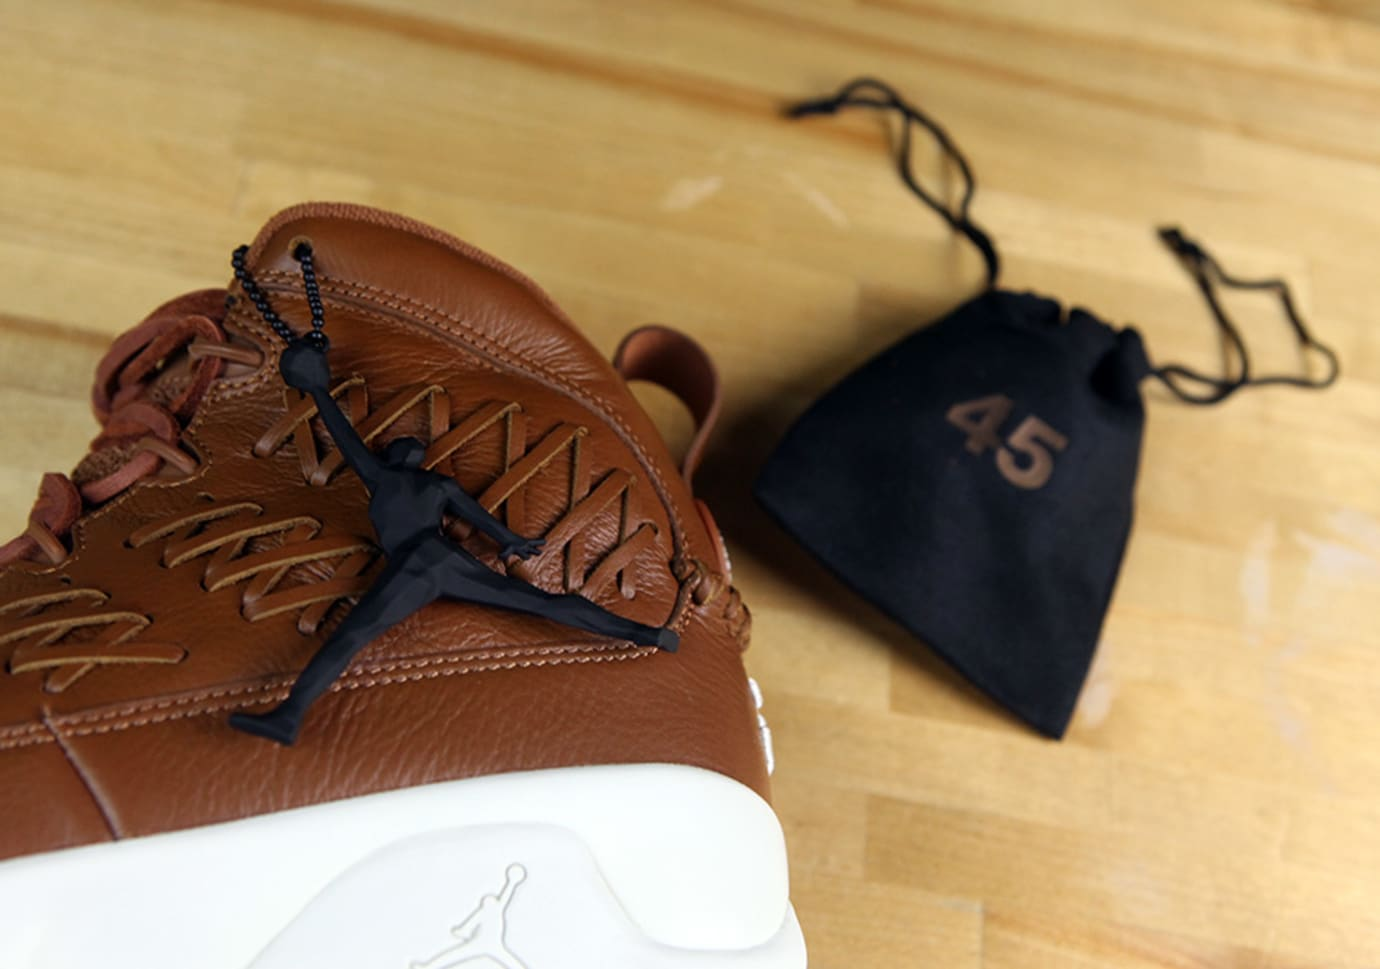 918c71518f9e Air Jordan 9 Baseball Glove Release Date Packaging AH6233-903